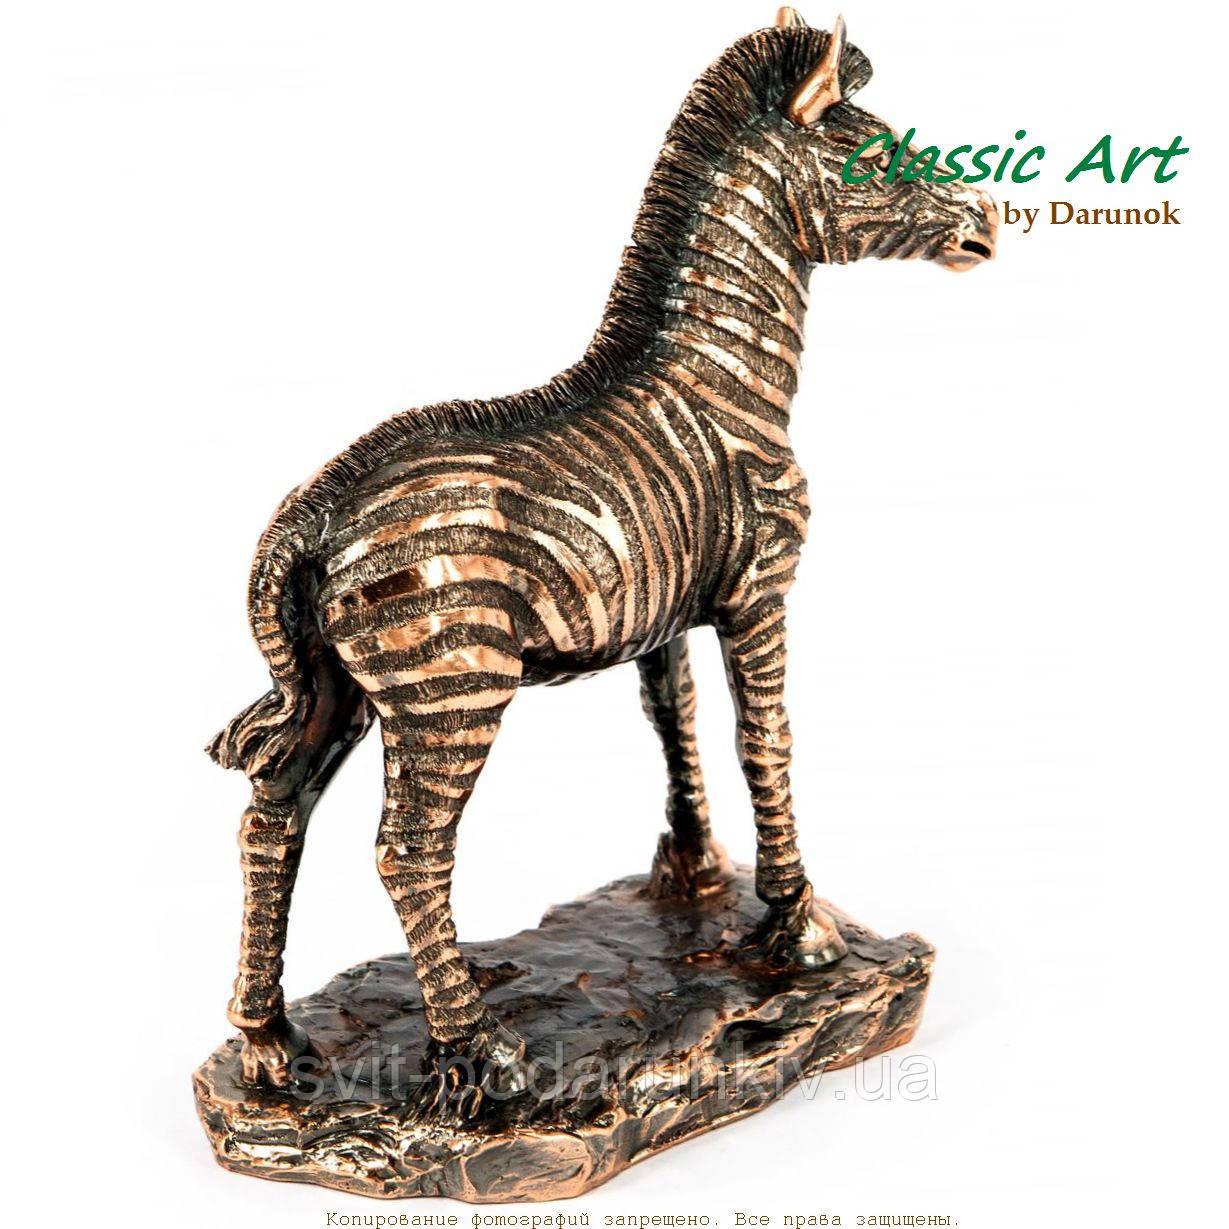 Статуэтка зебра фигурка из полистоуна